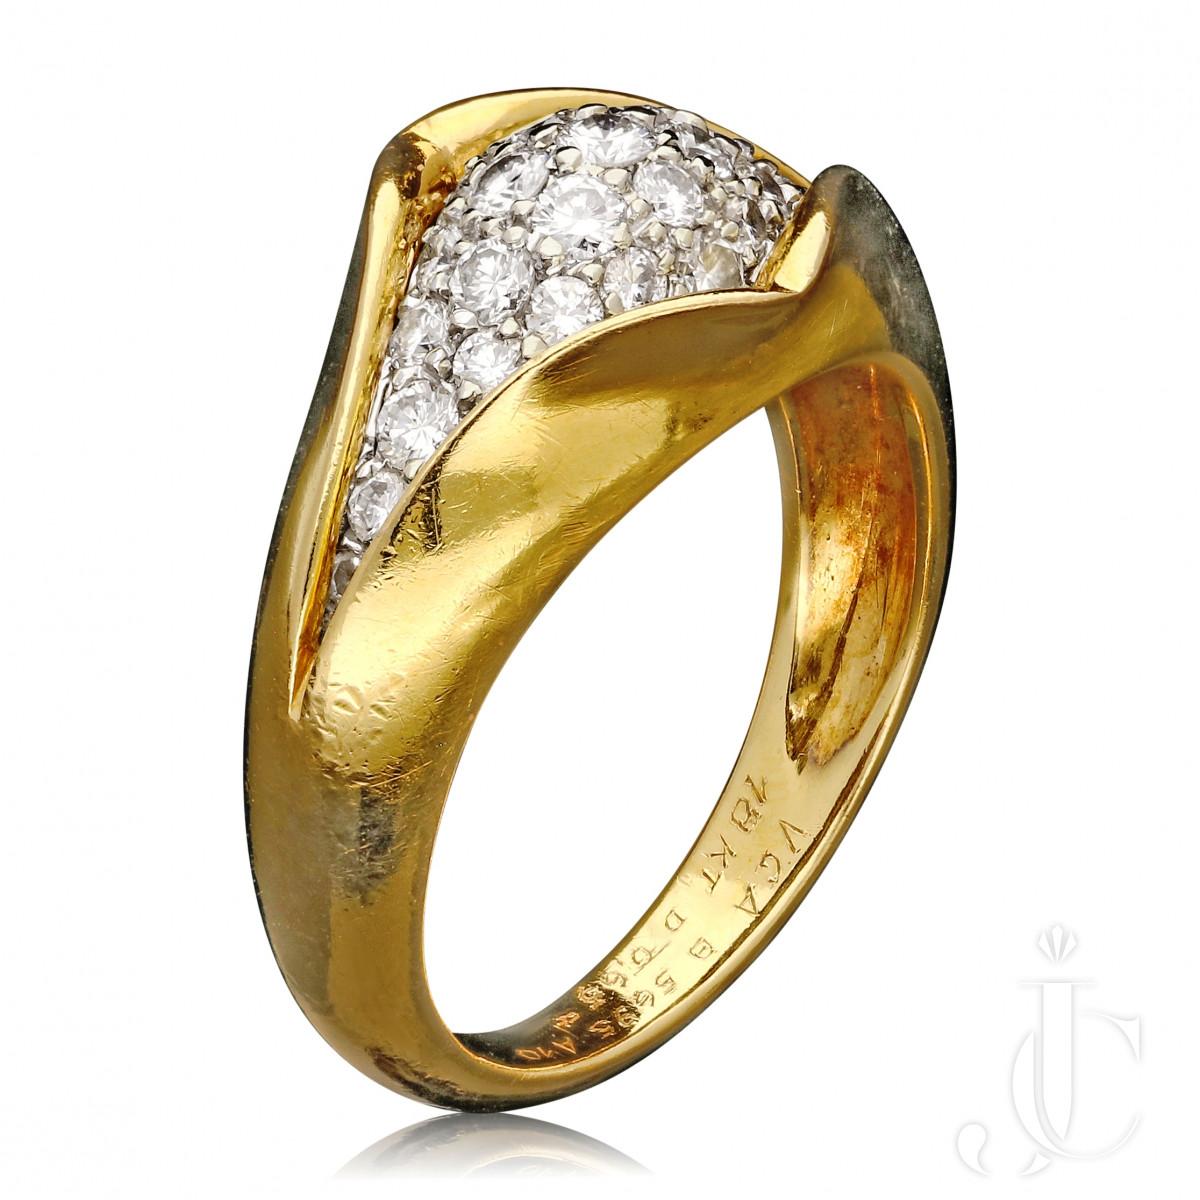 Van Cleef & Arpels - Pave set Diamond & Gold Ring c1970s